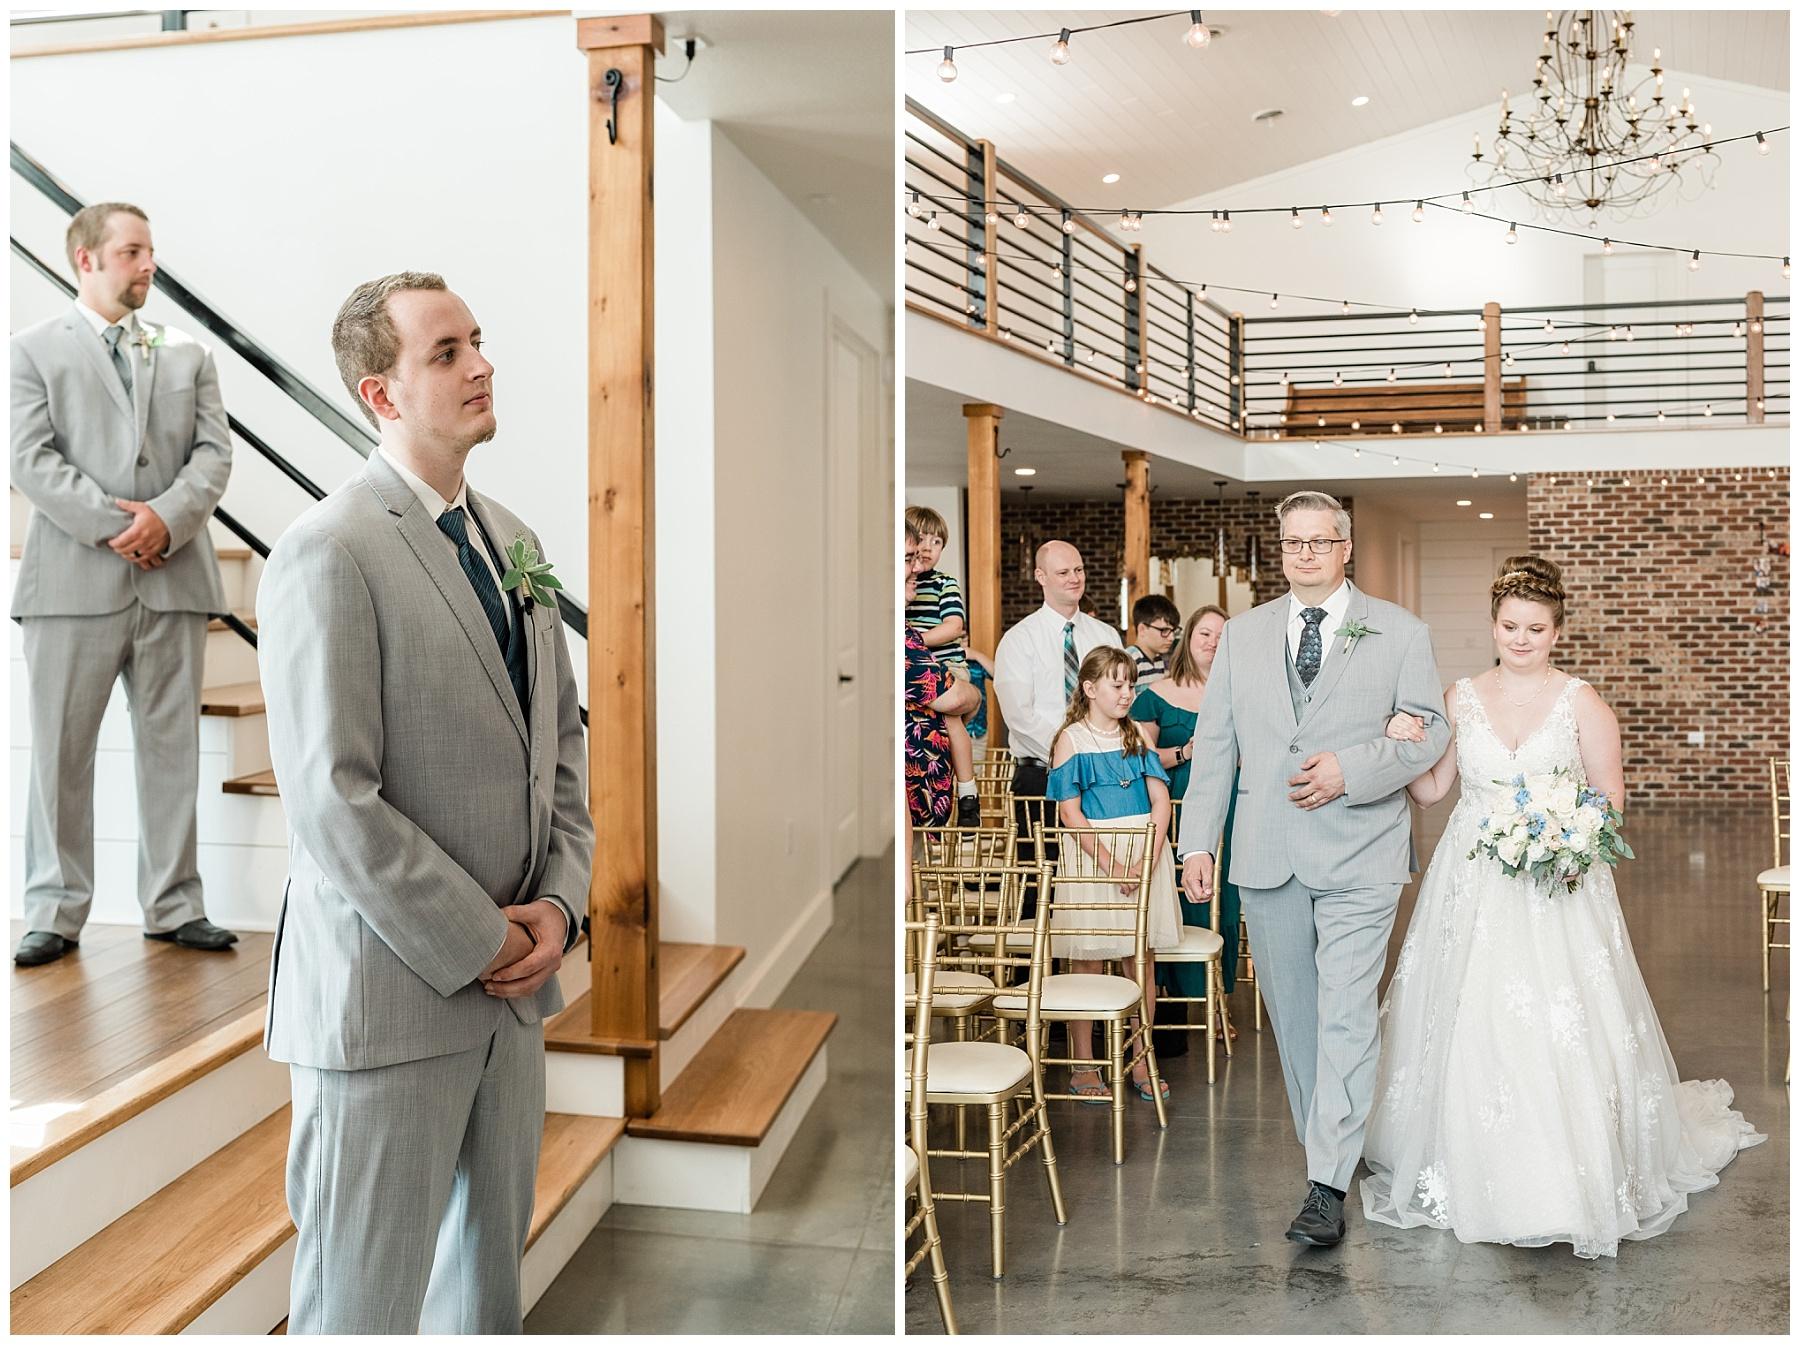 Intimate Summer Wedding at Emerson Fields by Kelsi Kliethermes Photography Best Missouri and Maui Wedding Photographer_0035.jpg